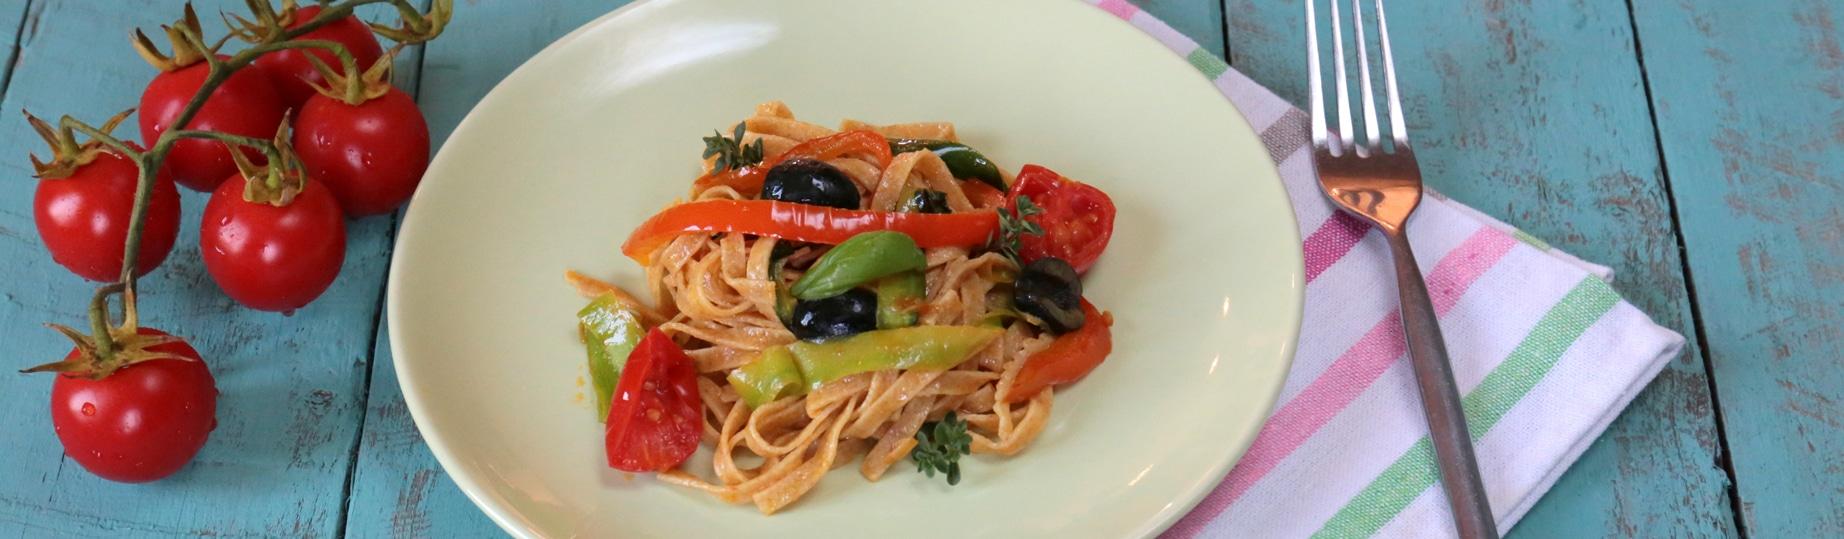 Tagliatelle integrali con verdure miste e curcuma